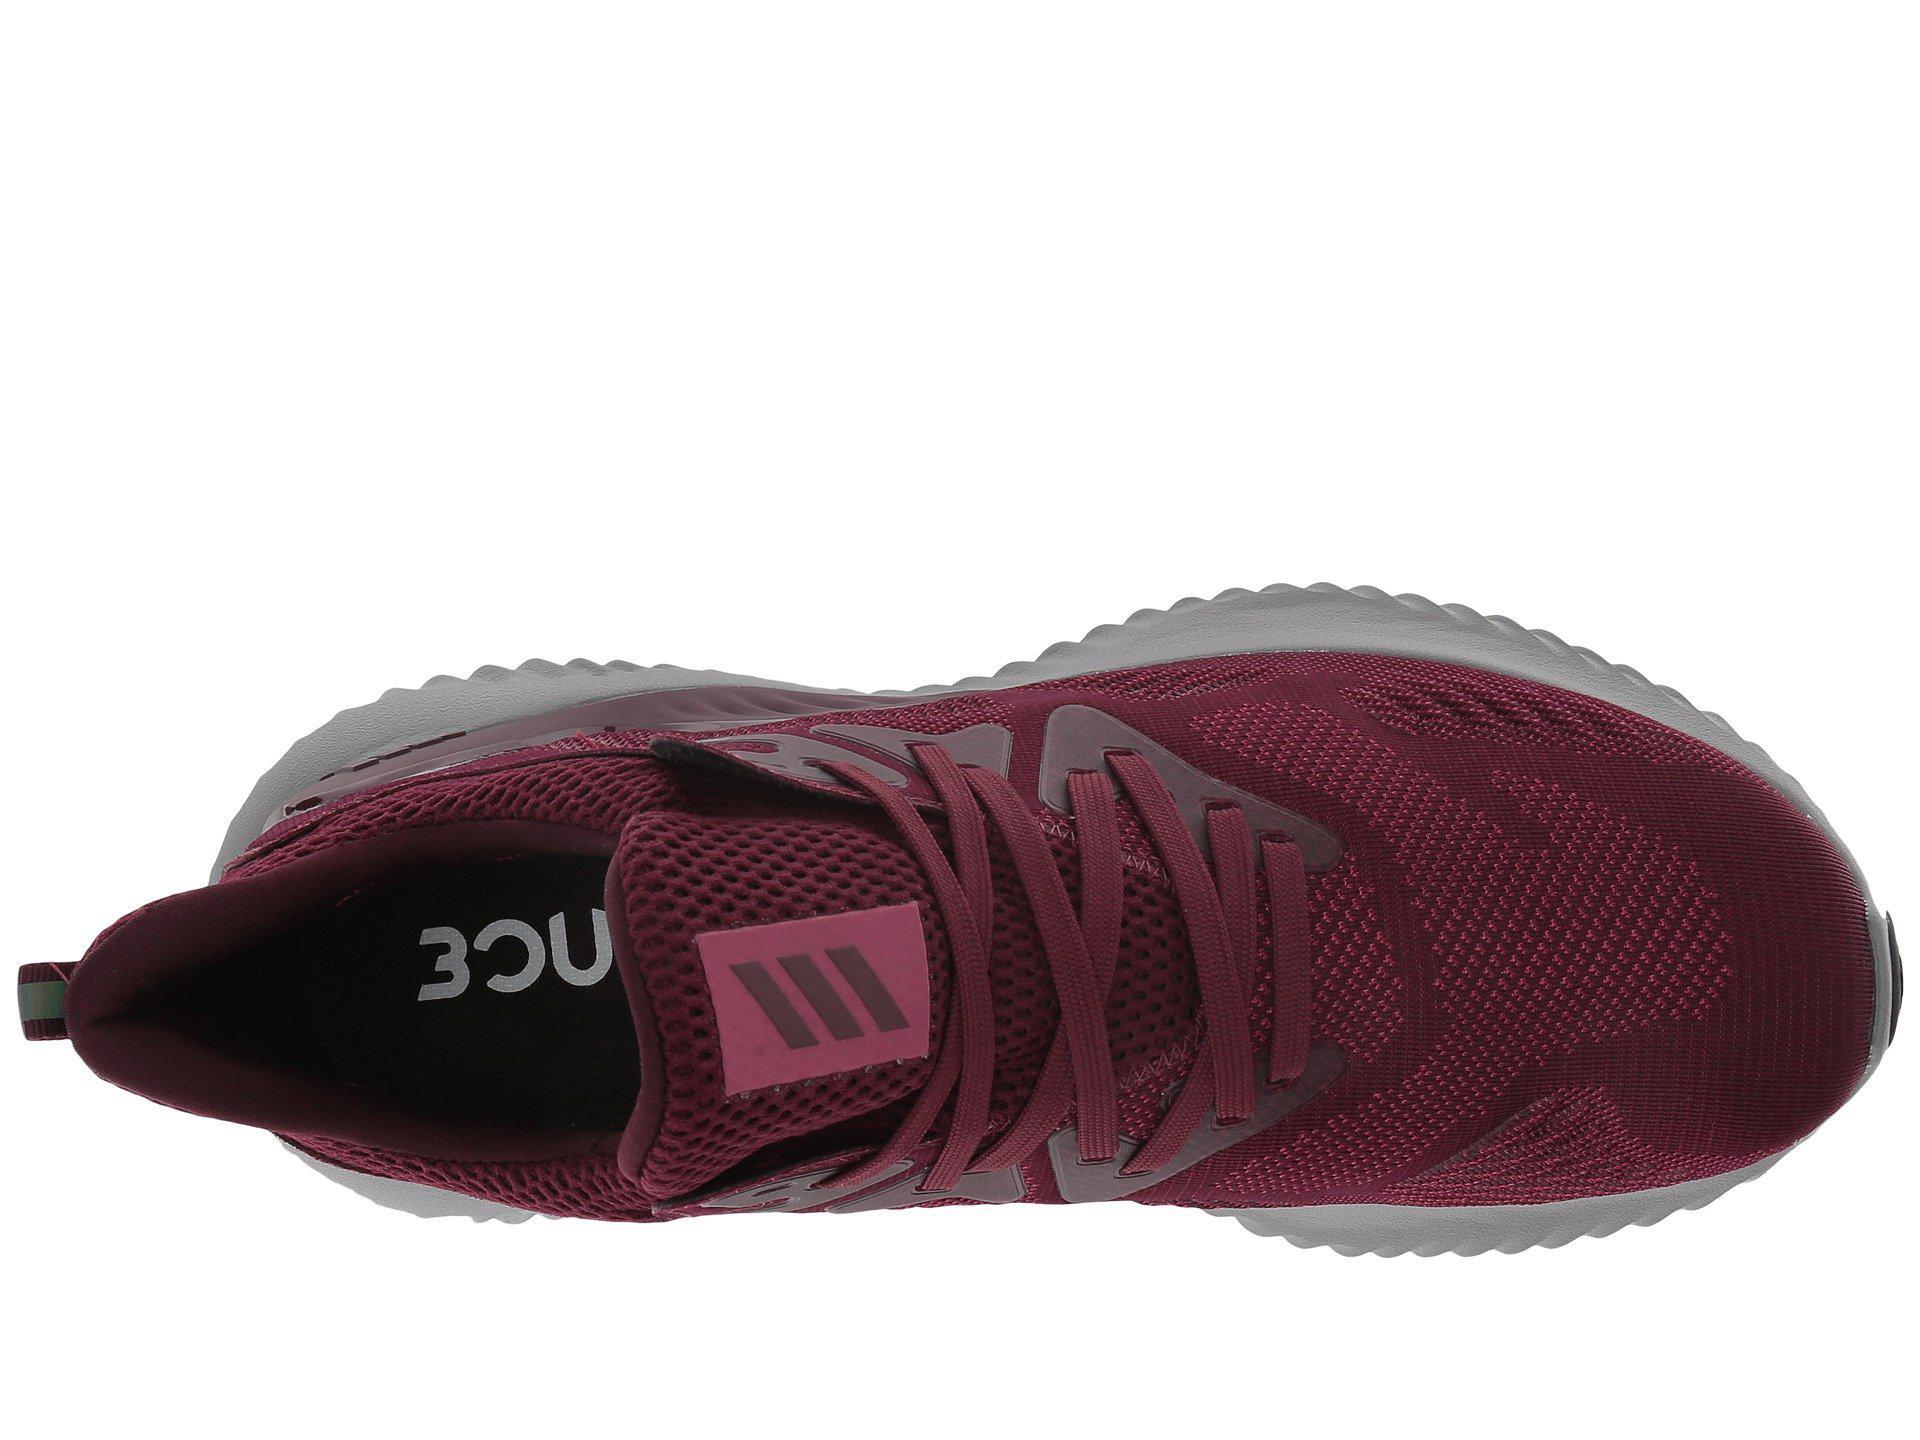 9821778802e07 Lyst - adidas Originals Alphabounce Beyond (maroon maroon mystery ...